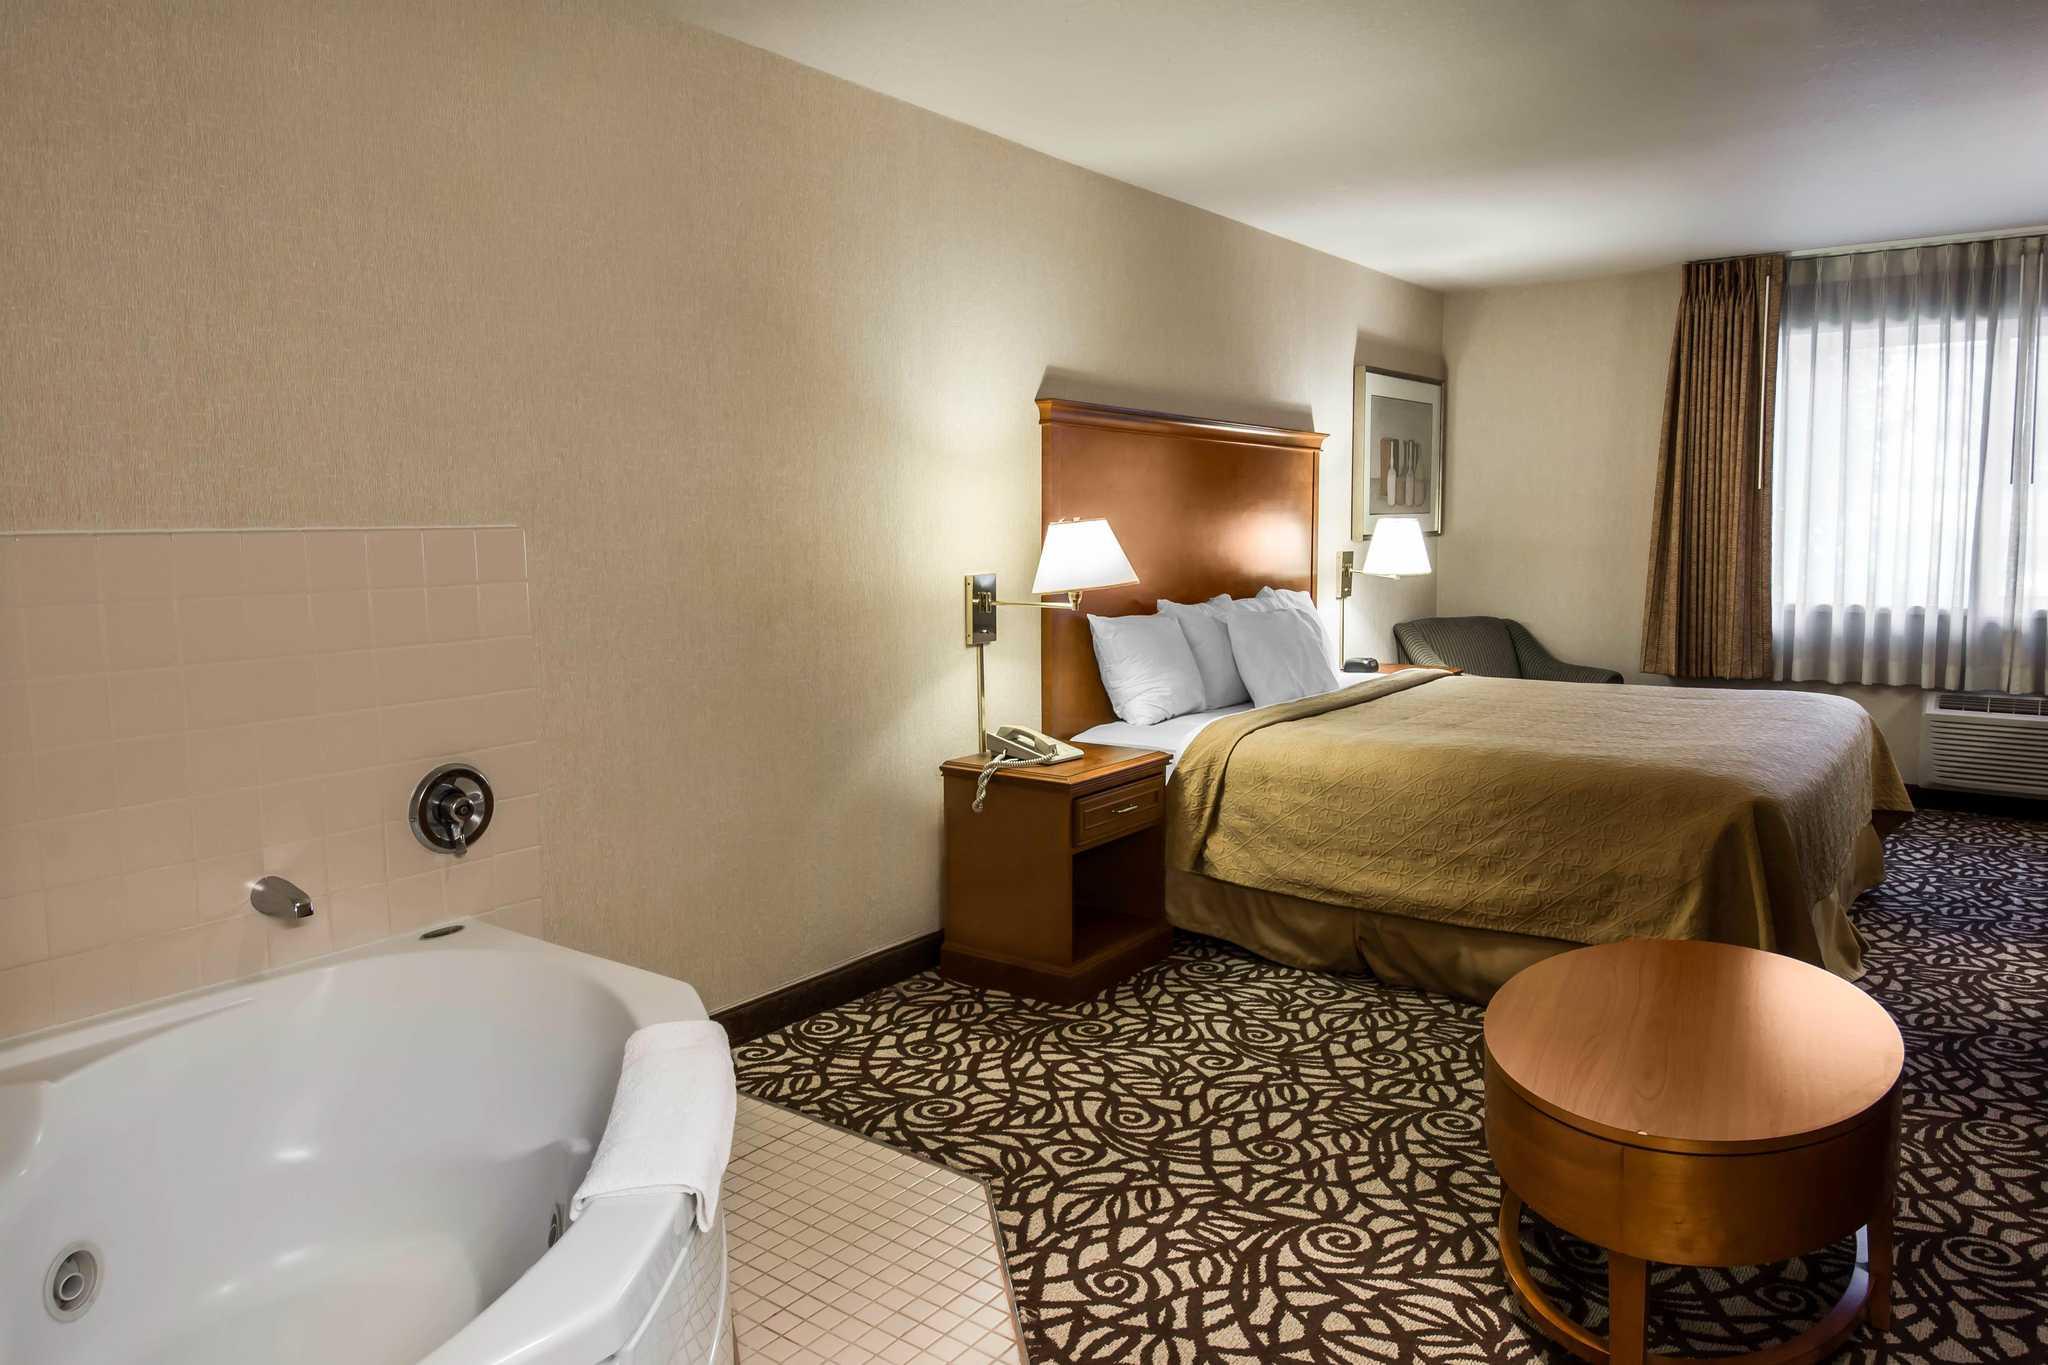 Quality Inn image 31